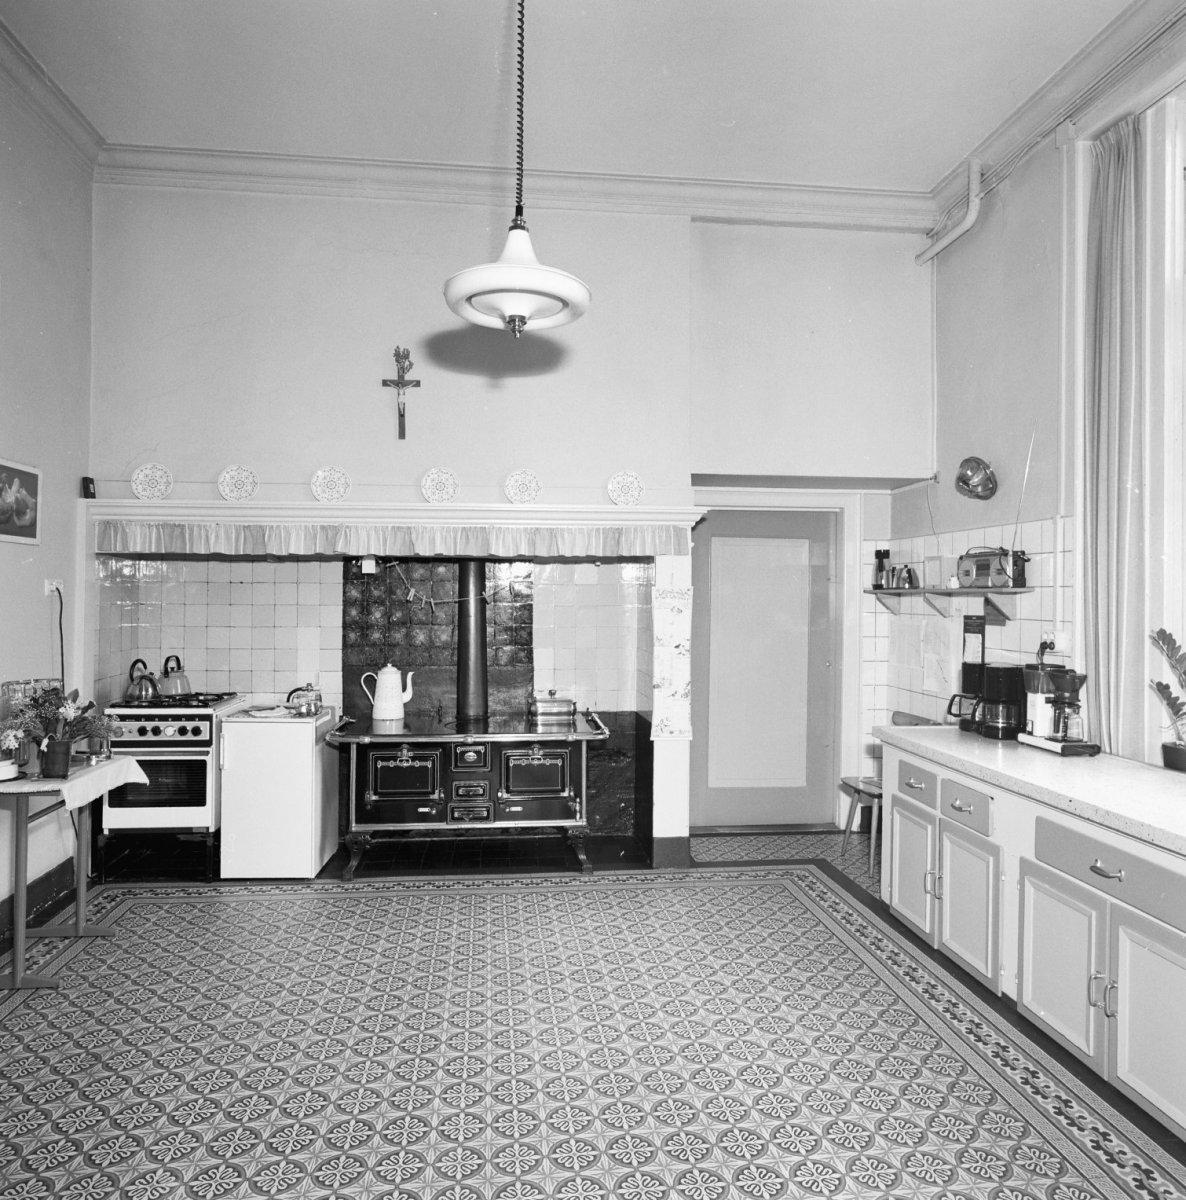 File interieur begane grond keuken met tegelvloer for Interieur keuken